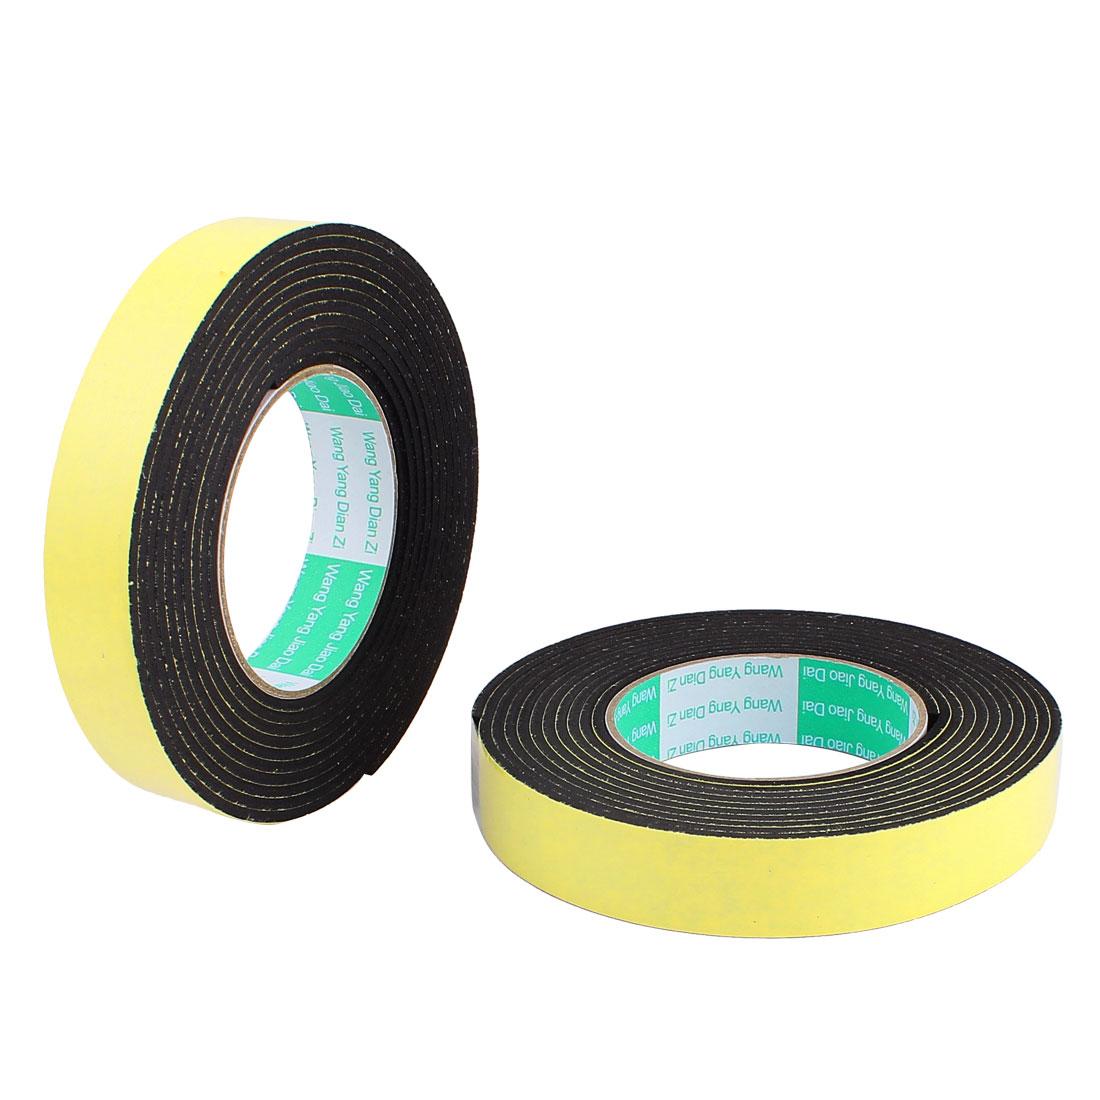 "2 Pcs 0.98""Width 13.12ft Length 3MM Thick Single Sided Sealing Shockproof Sponge Tape"